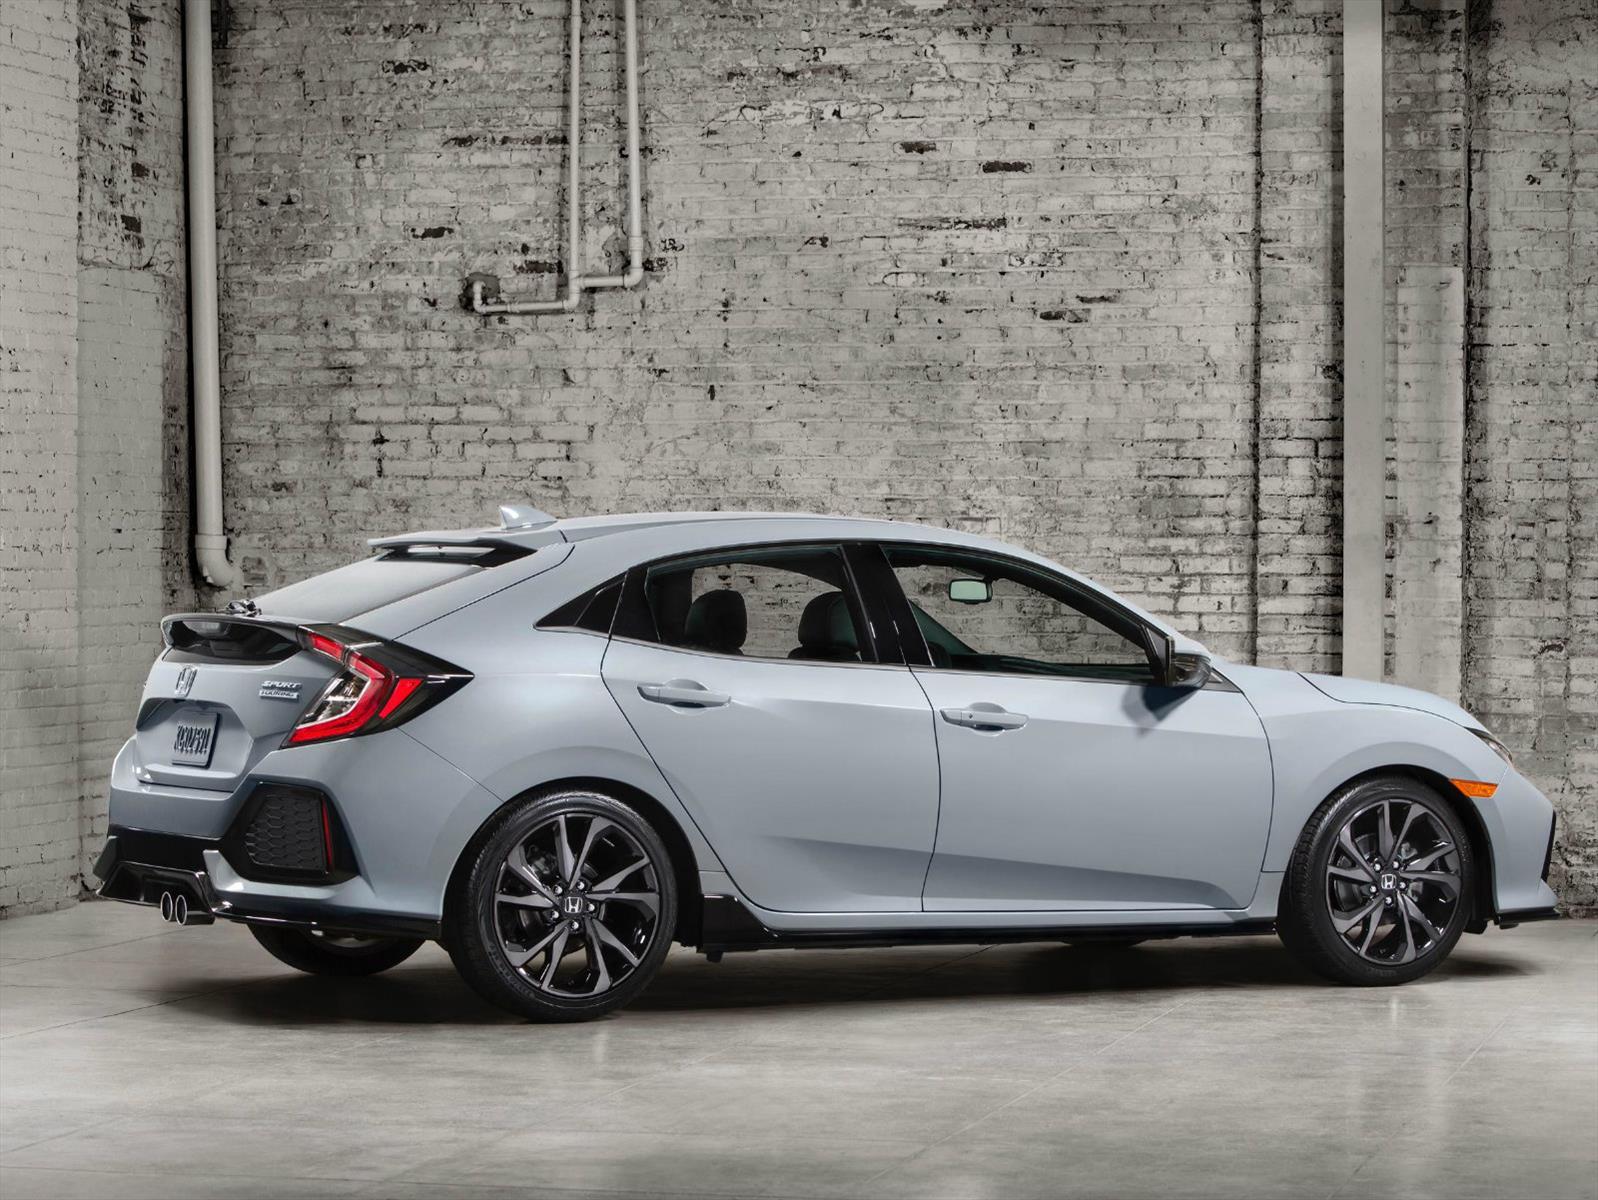 Honda Civic Hatchback 2017, moderno y deportivo